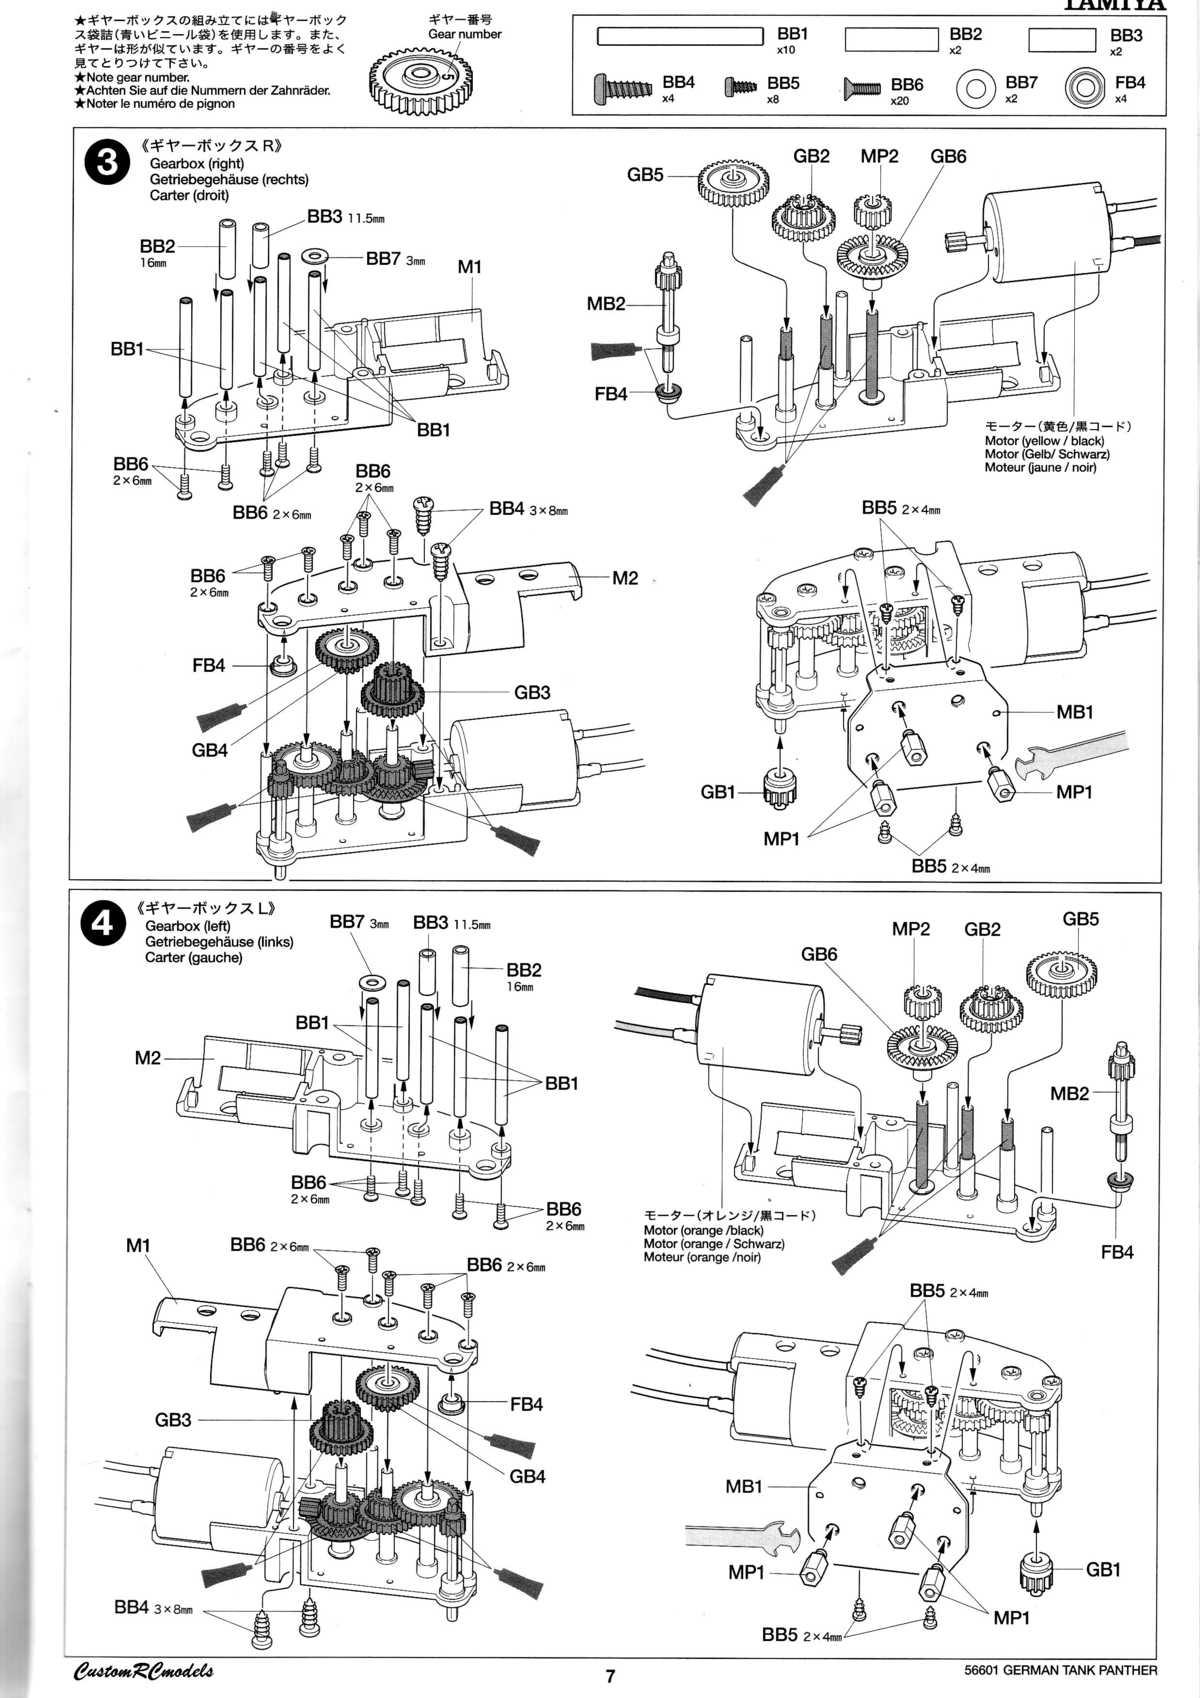 1/25 Panther manual page 07